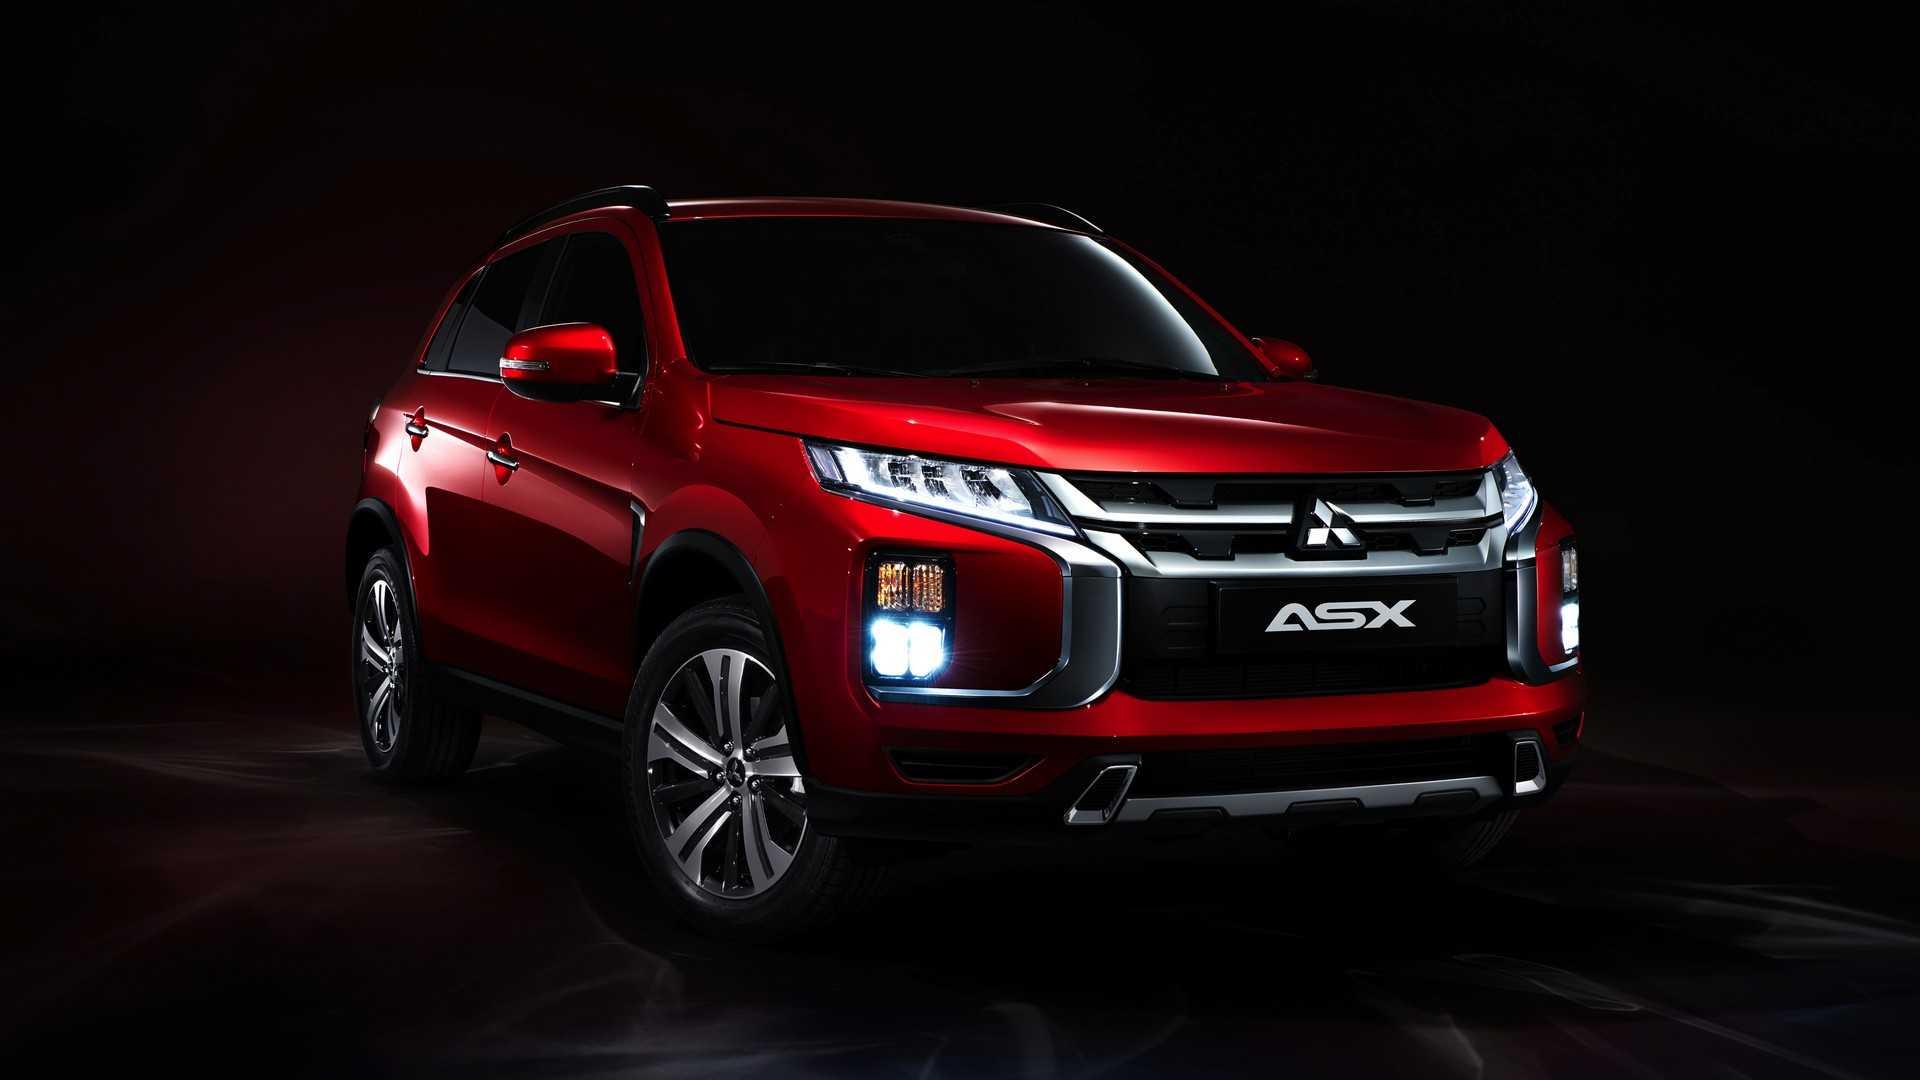 49 Great Mitsubishi Asx 2020 Specs New Concept by Mitsubishi Asx 2020 Specs